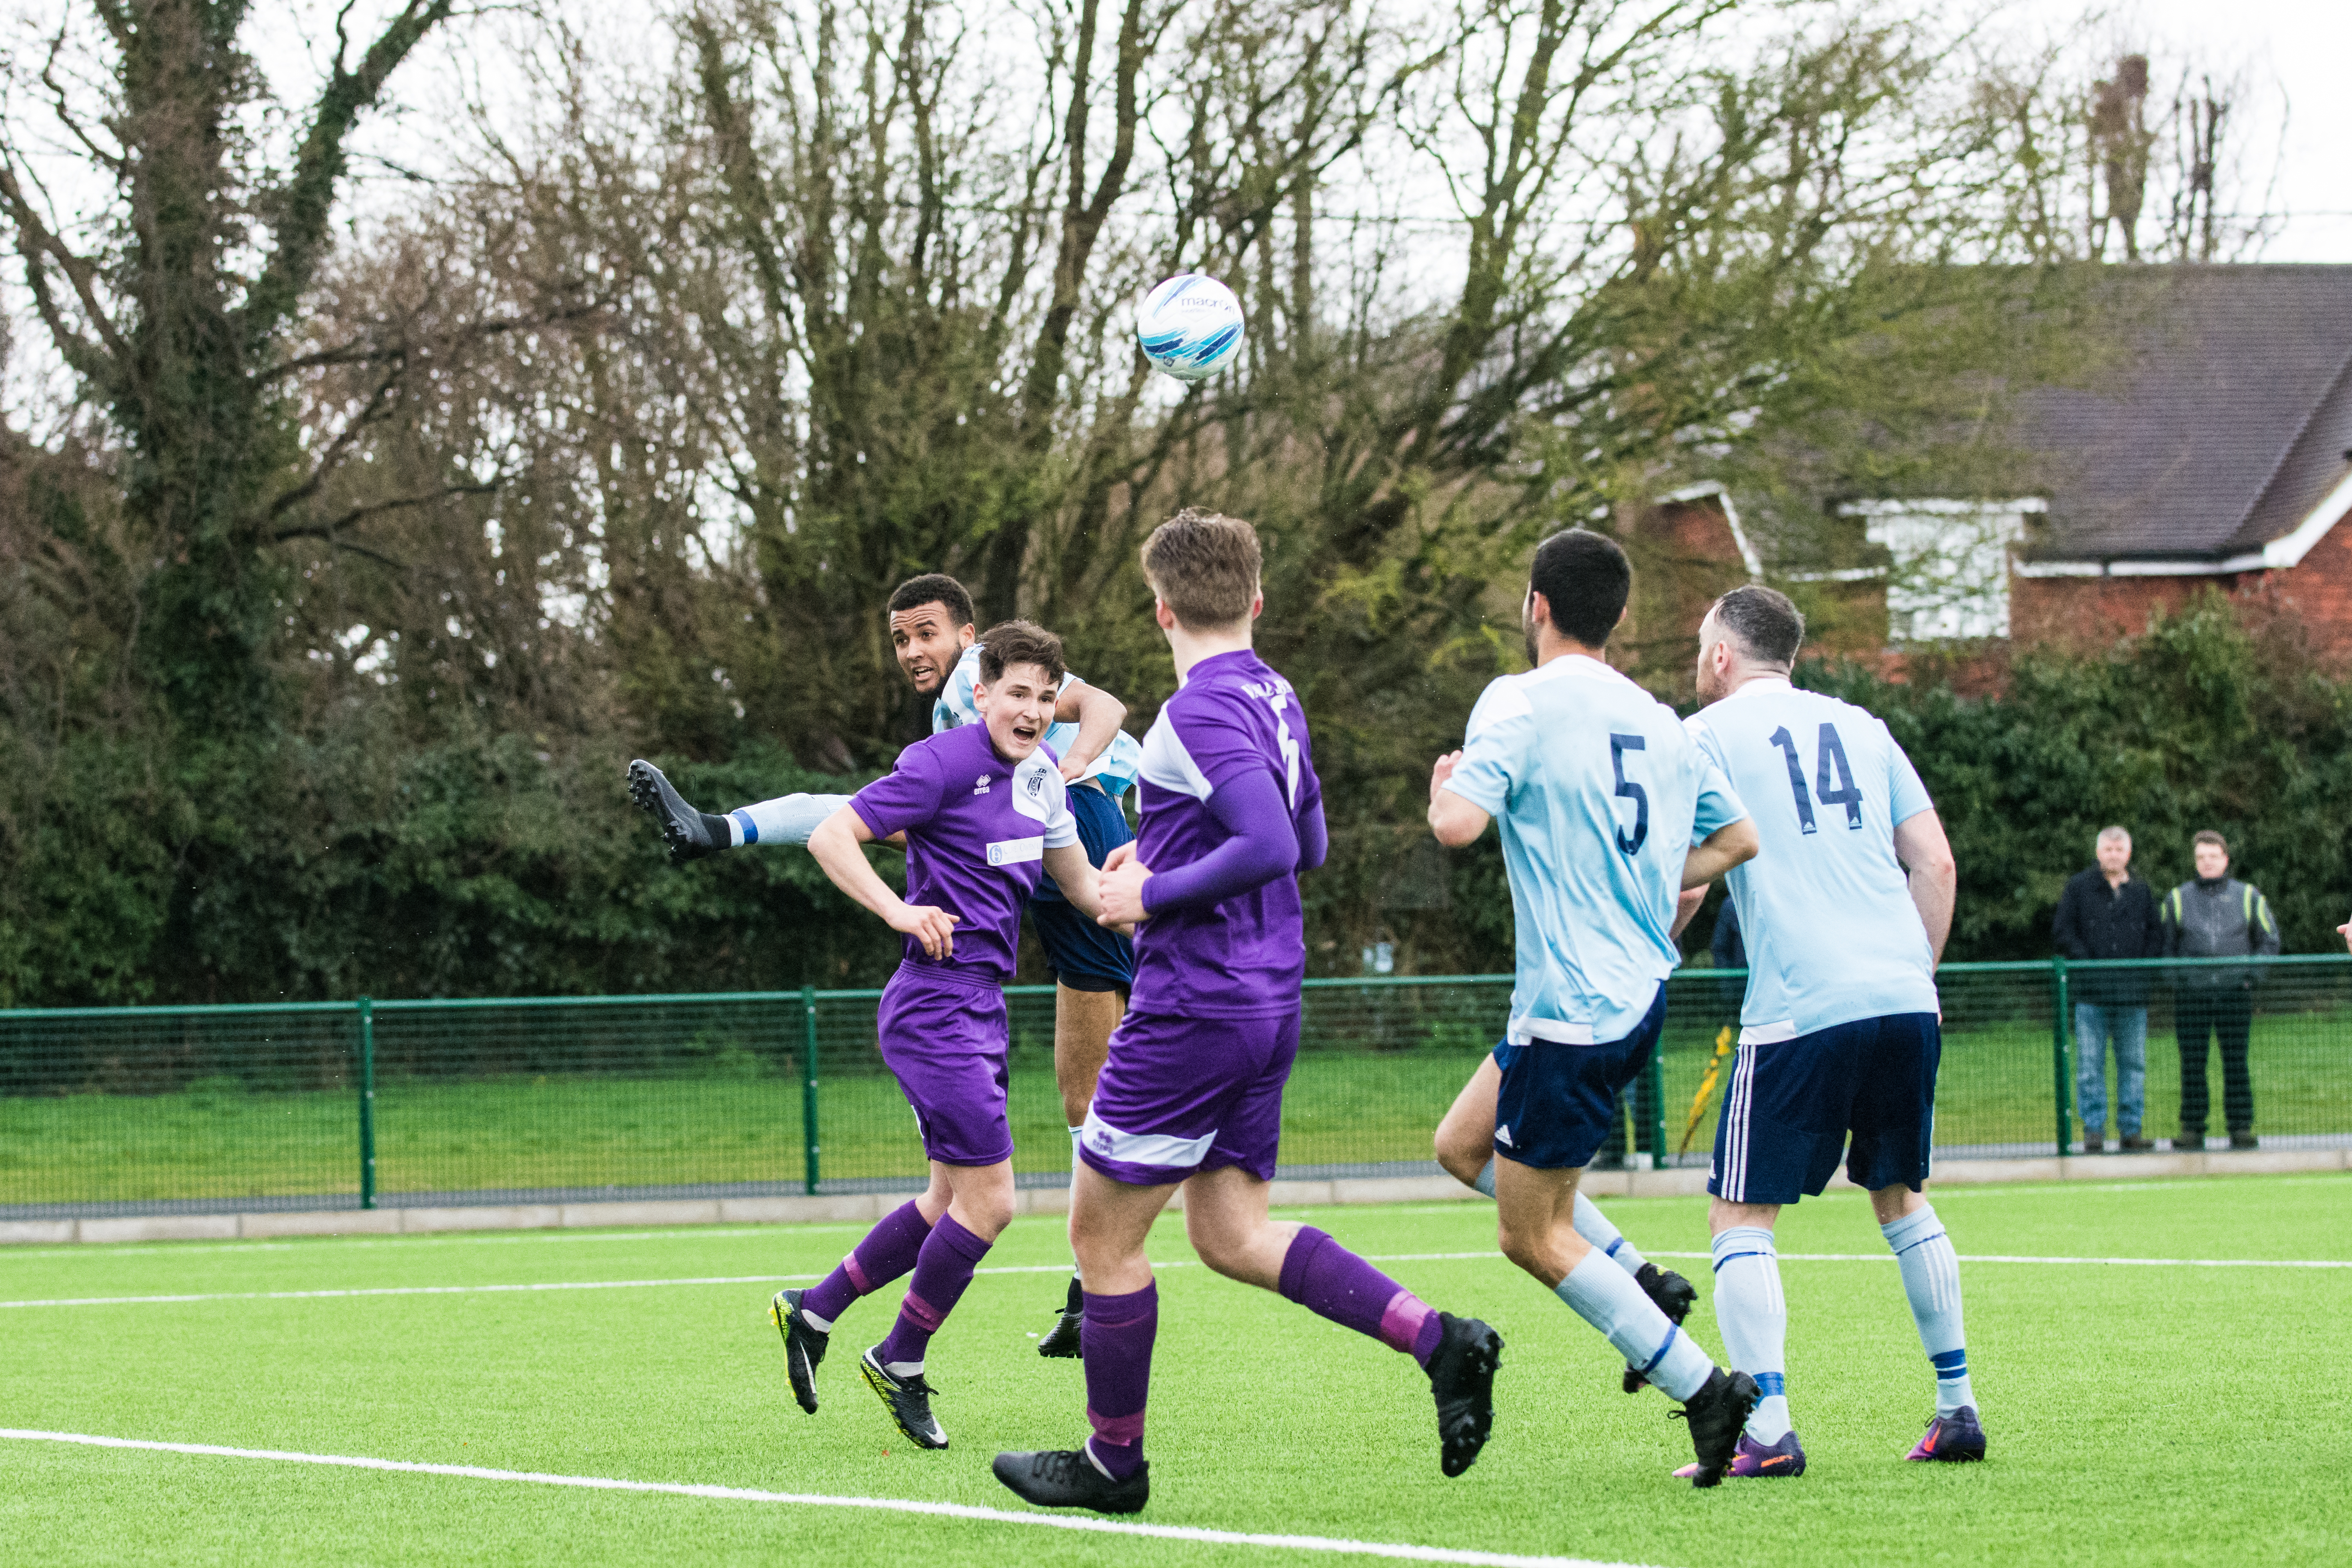 DAVID_JEFFERY Worthing United FC vs East Preston FC 02.04.18 87